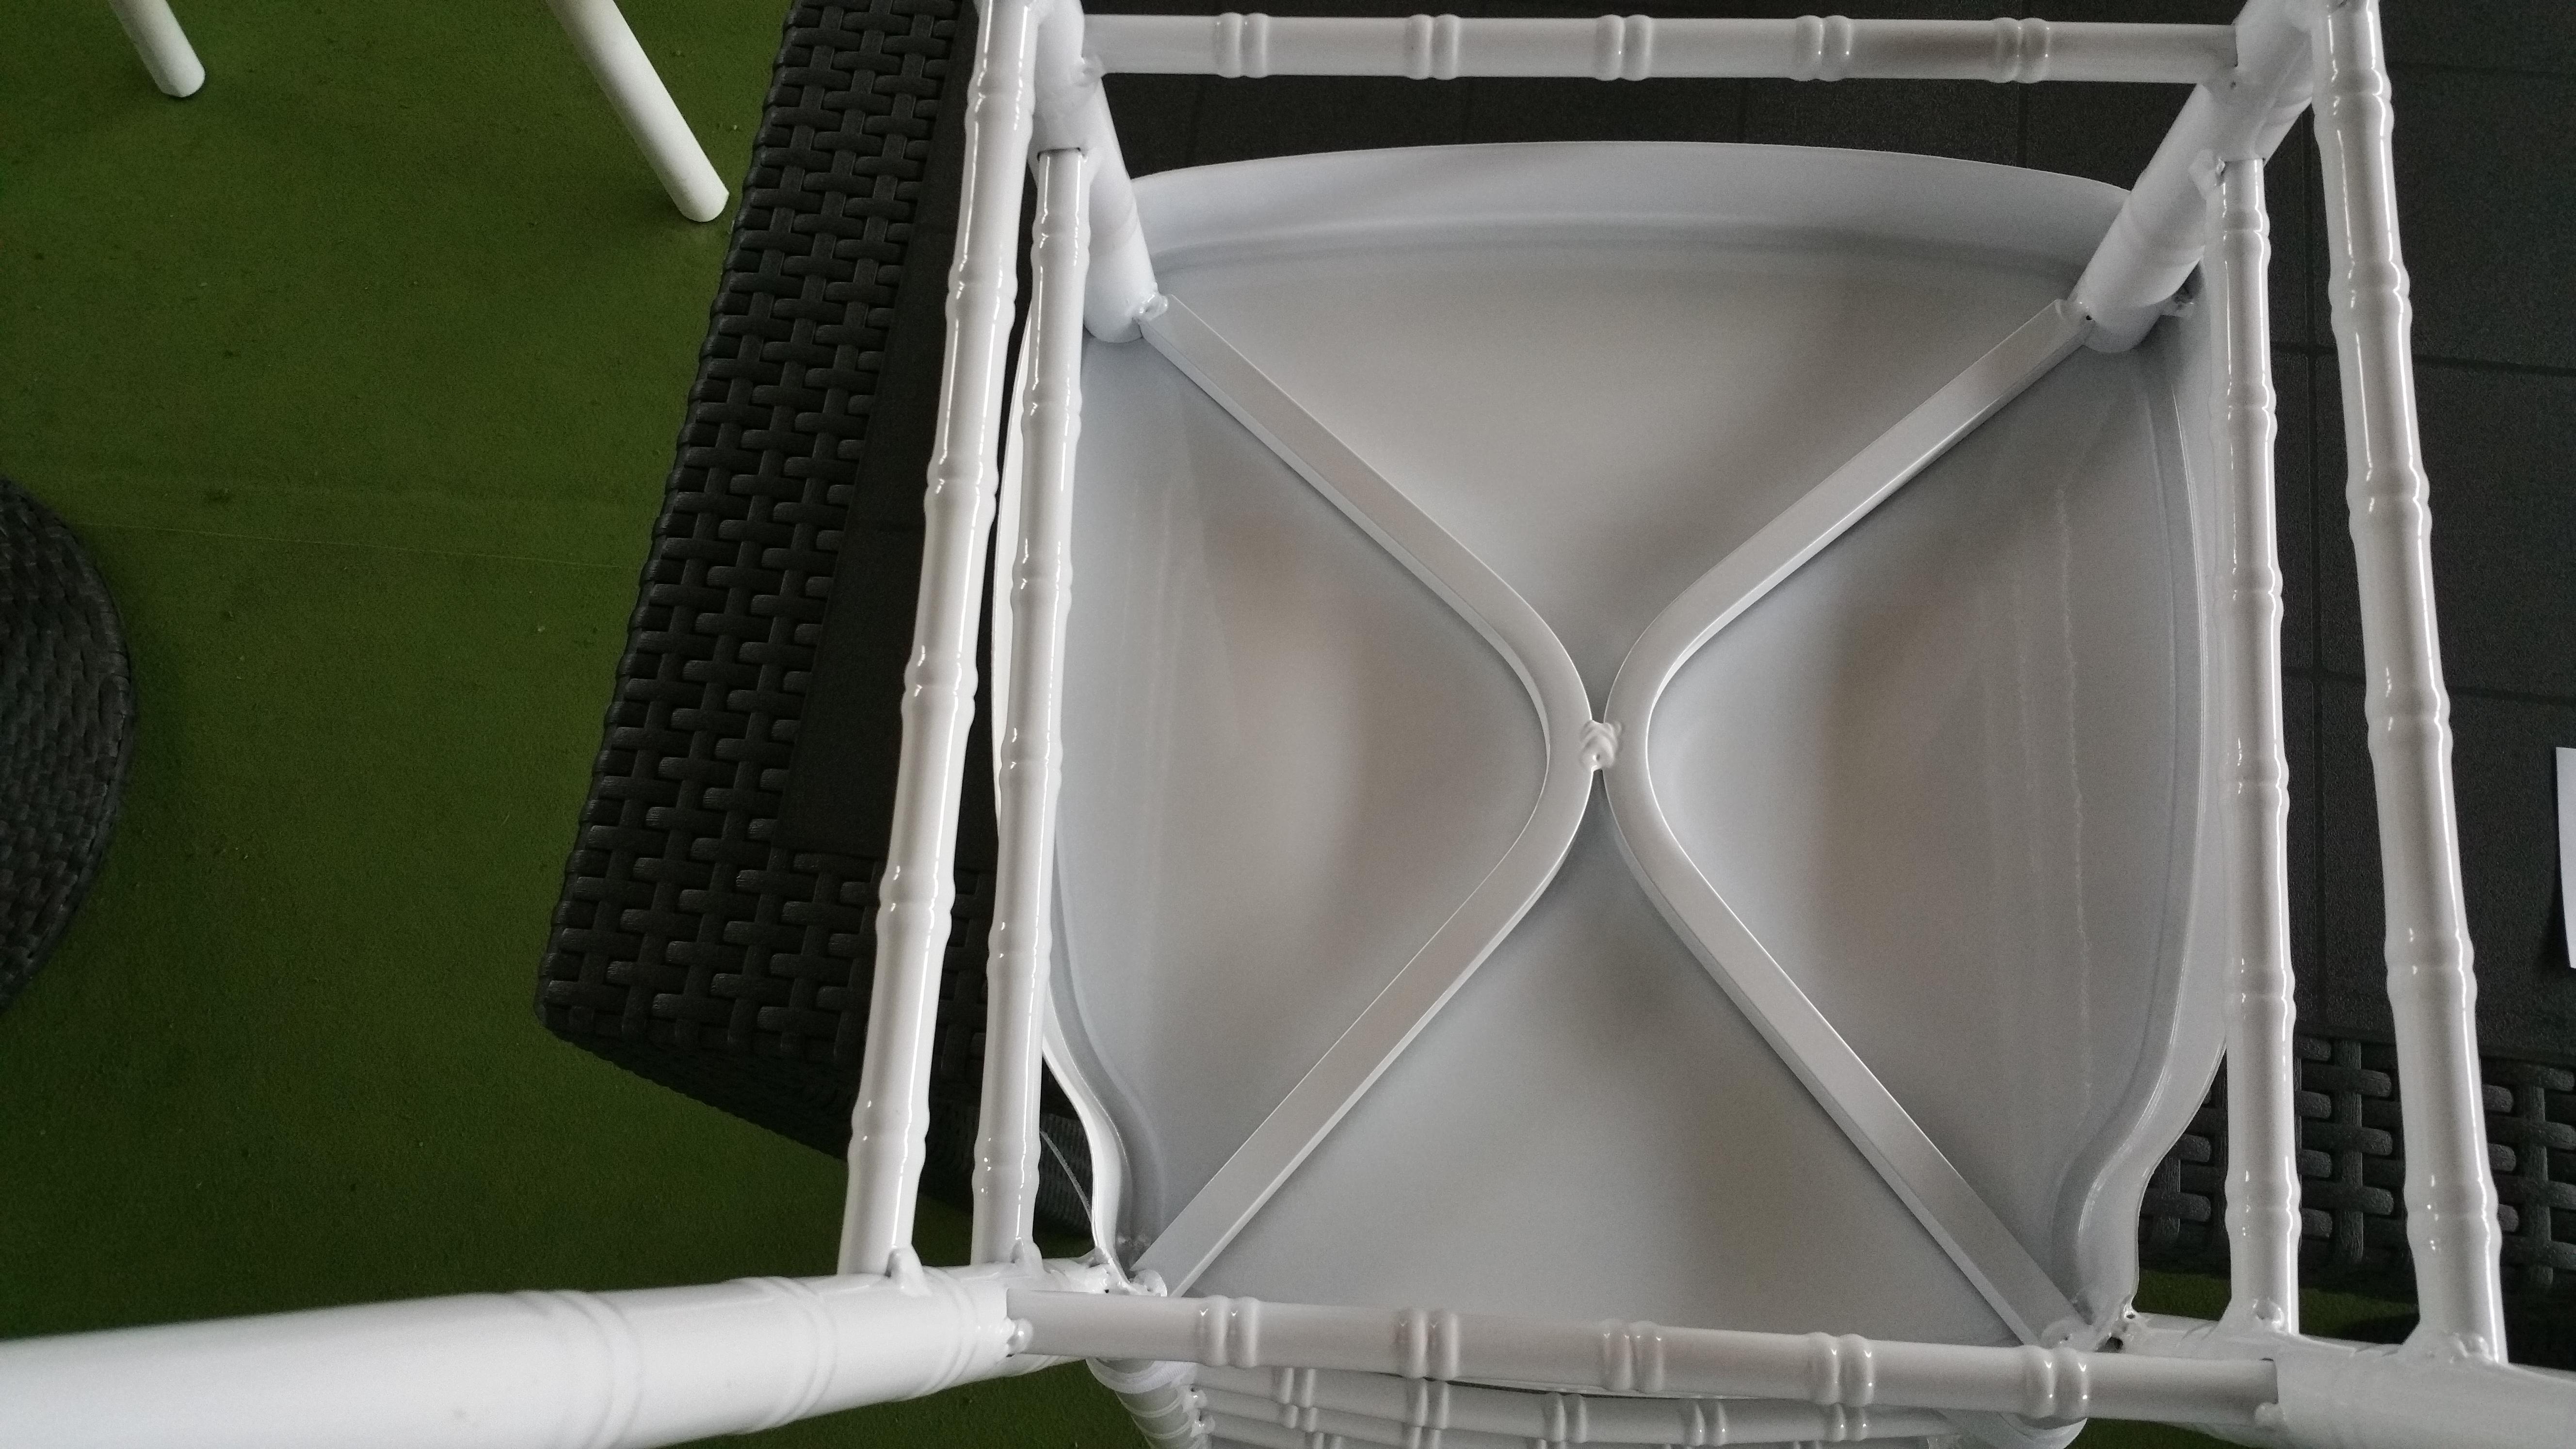 cs0801 - sedie da cucina - pallantestore - sedia in alluminio ... - Cuscini Da Cucina